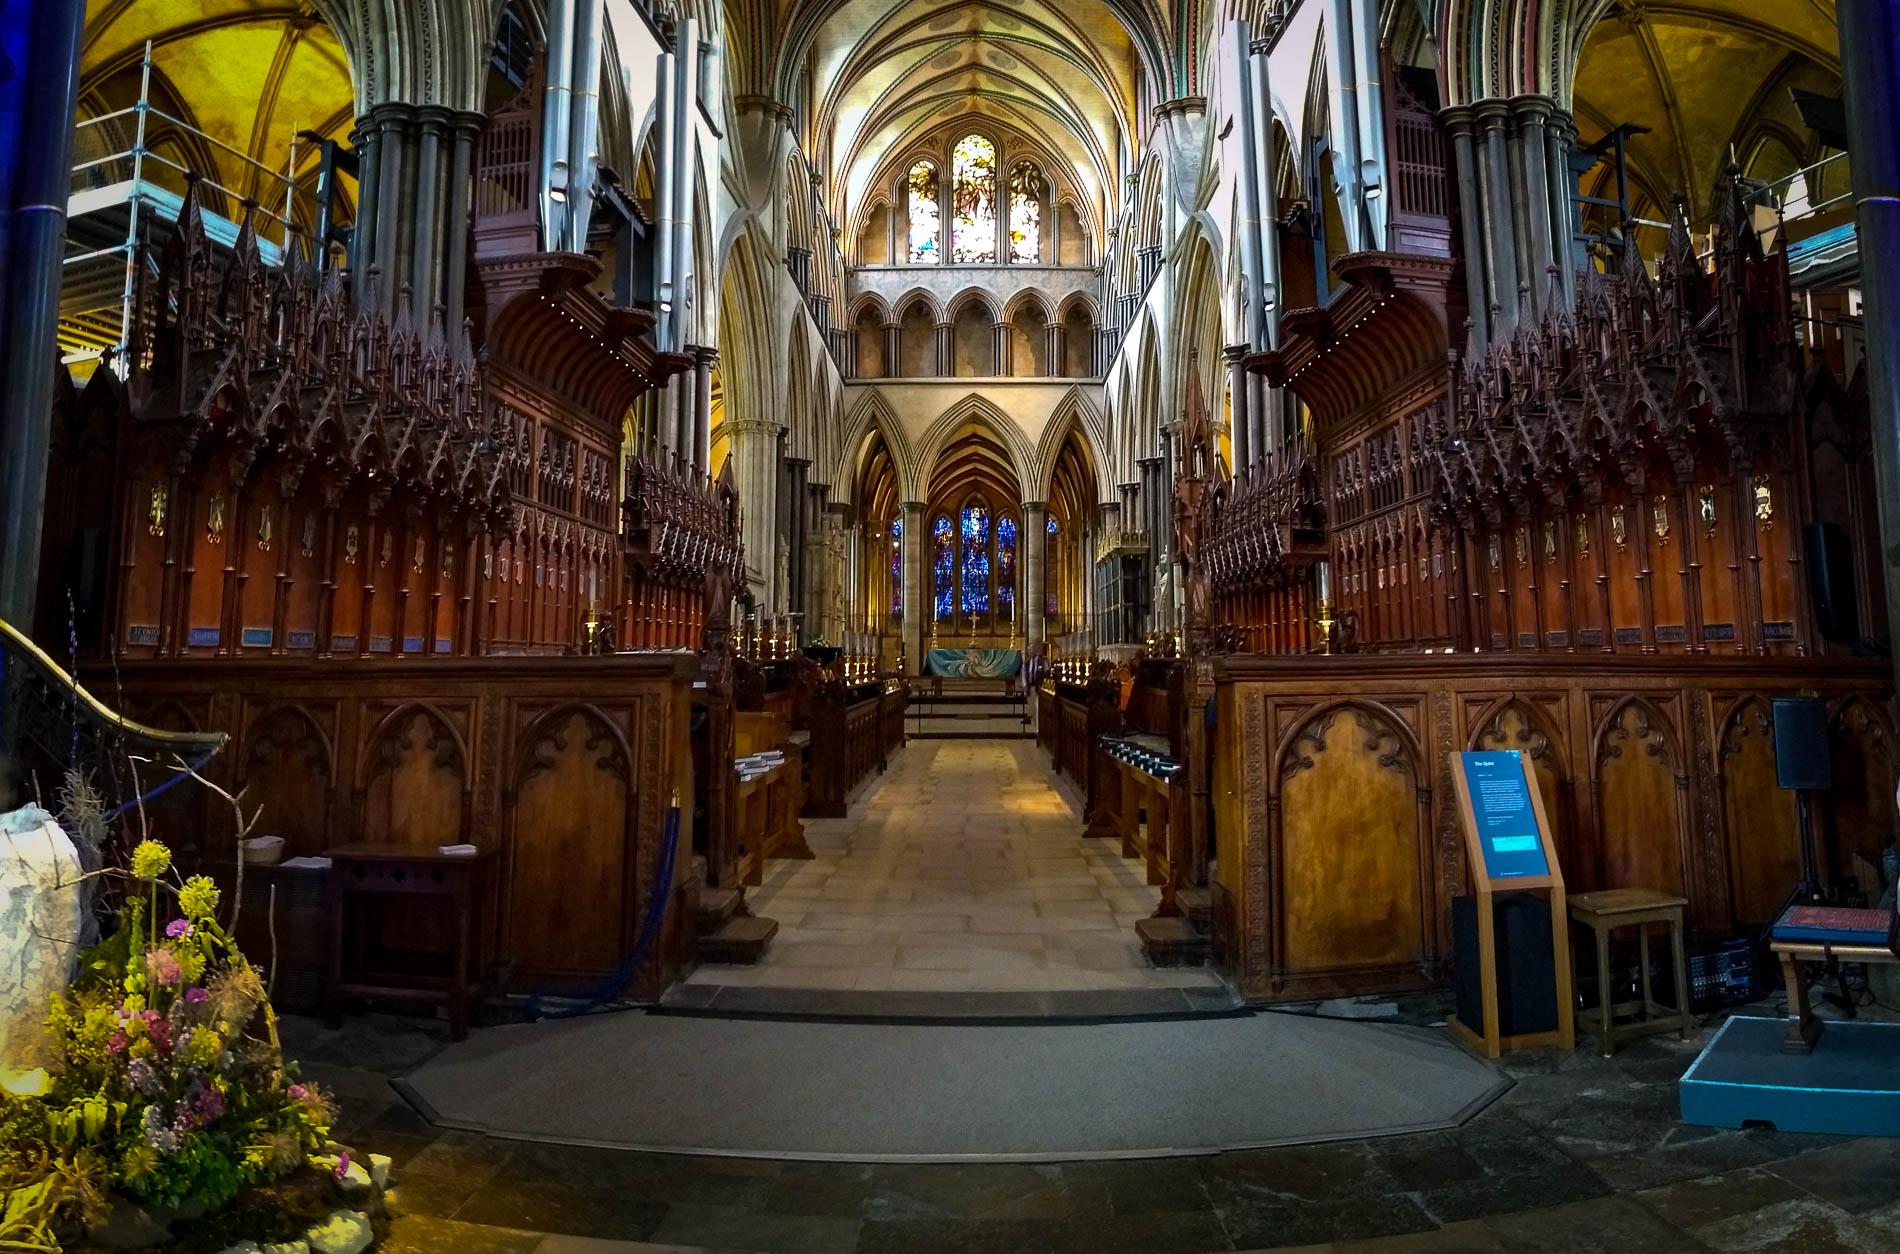 Salisbury Cathedral in Southwestern England